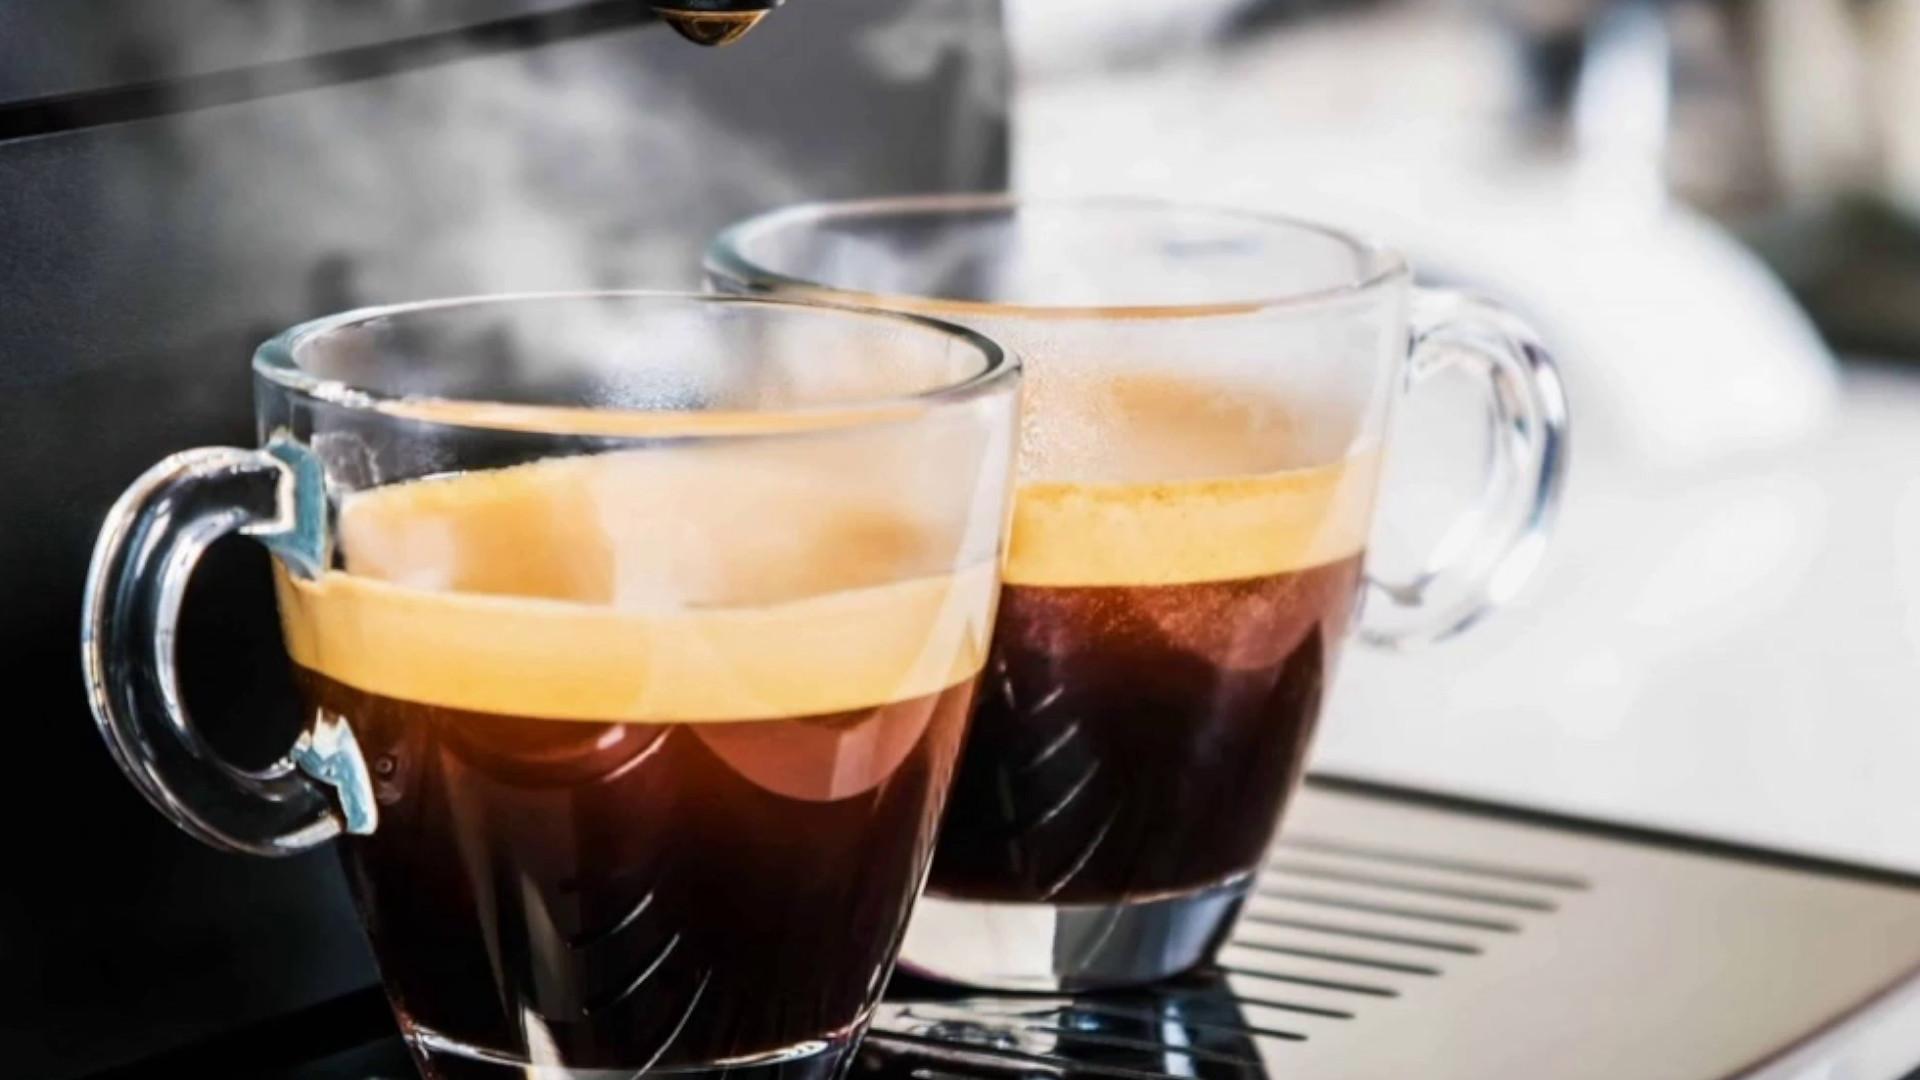 Virtual Coffee Machine App by Powell Software